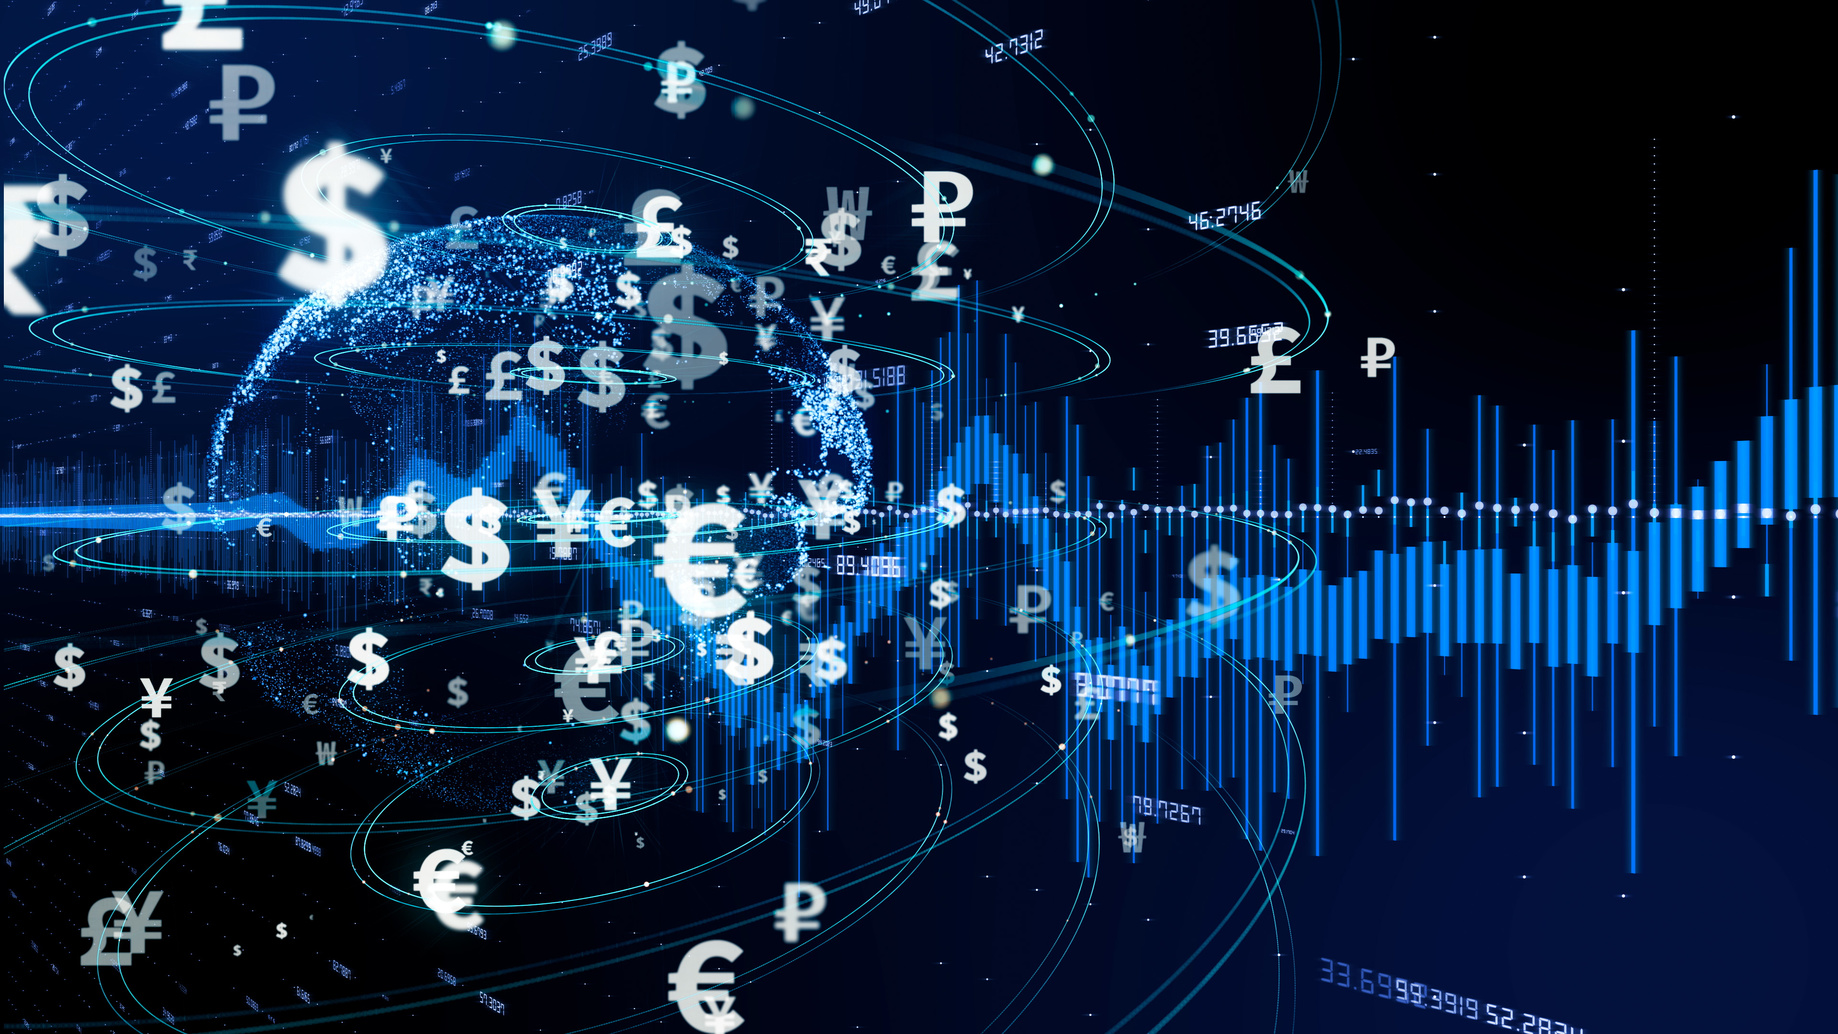 GFS講師『永濱利廣氏』の著書『知識ゼロからの経済指標』から景気指標を紐解く!